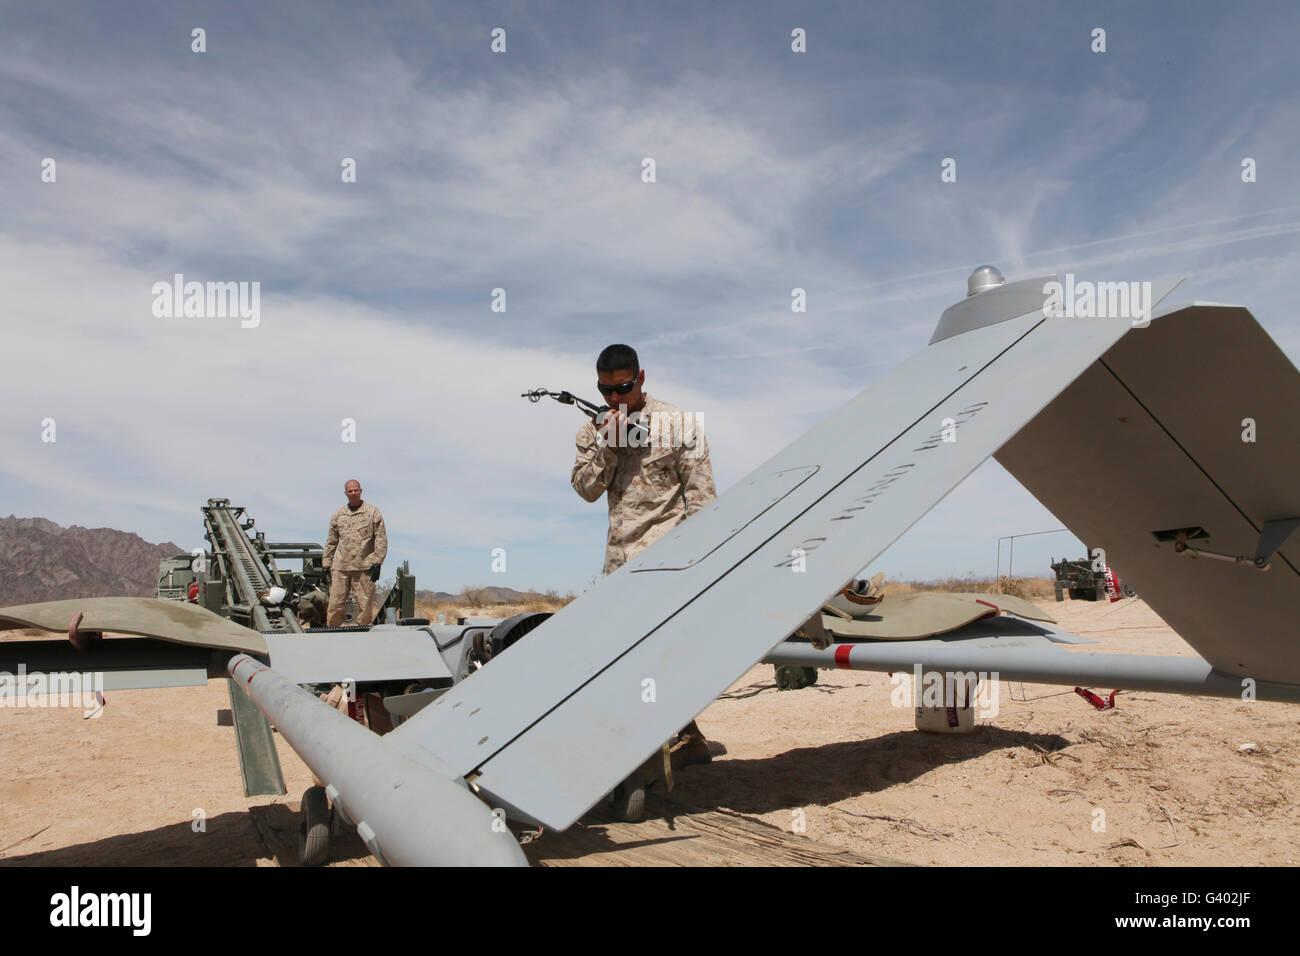 U.S. Marine performs a final preflight check on an RQ-7 Shadow. - Stock Image